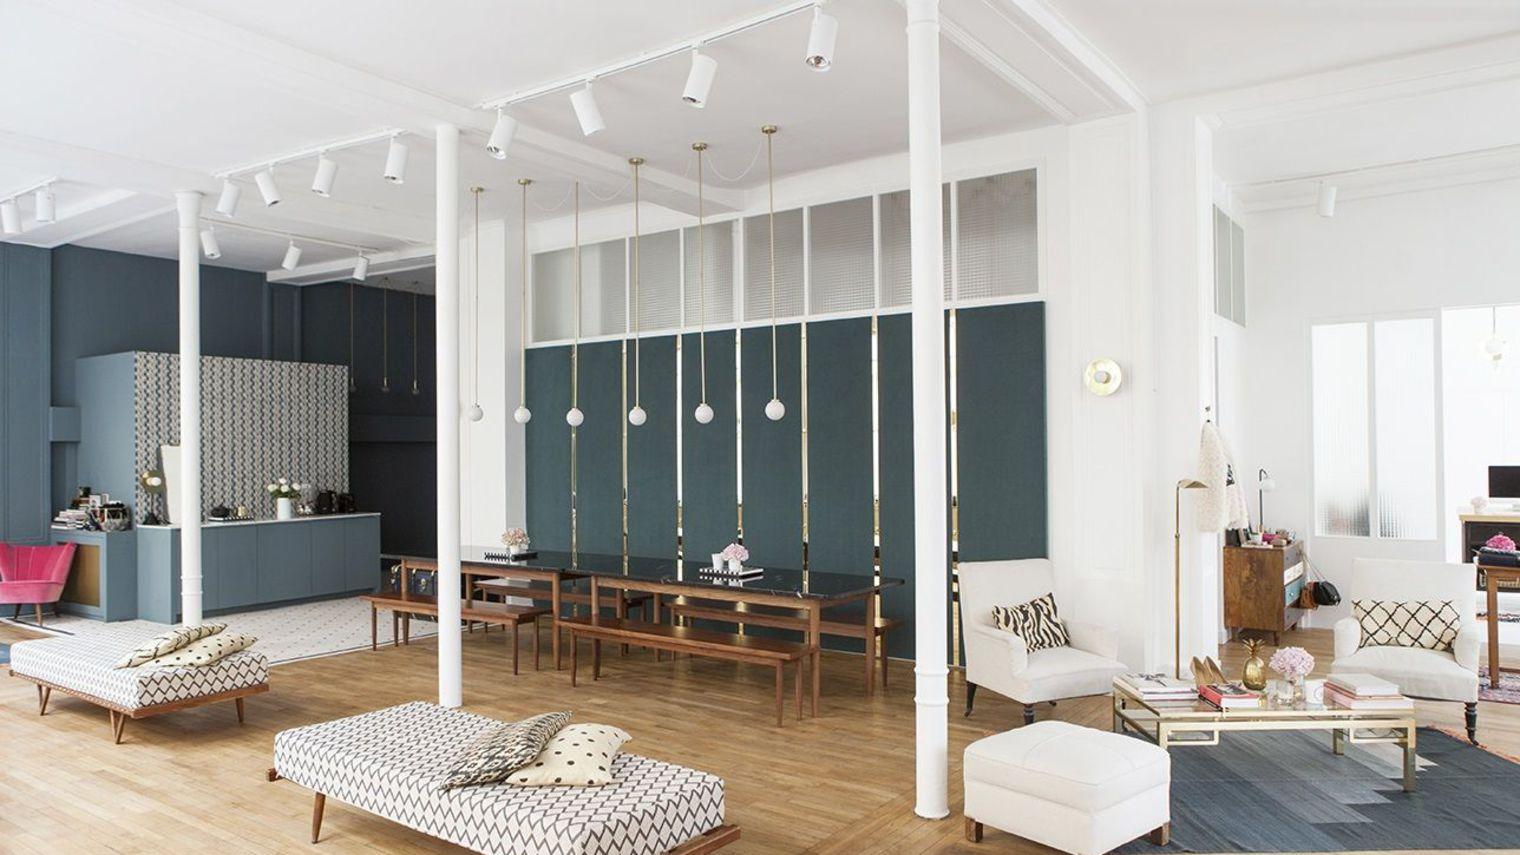 Achat appartement: définir d'abord vos besoins